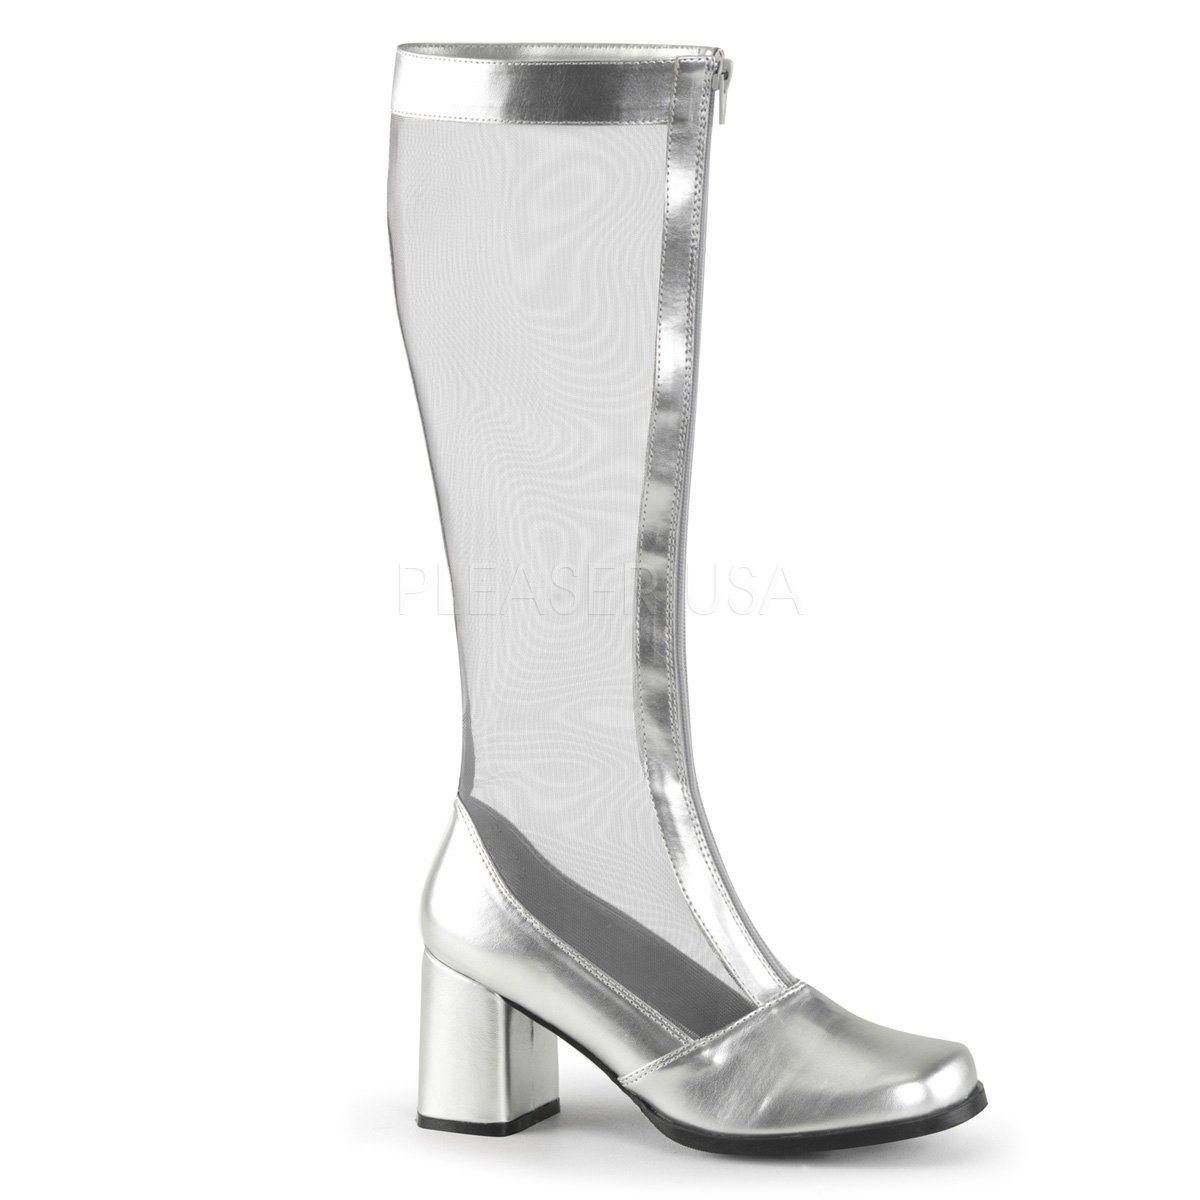 Funtasma Women's Gogo 307 Black Heel Mesh Fashion Boot PleaserUSA